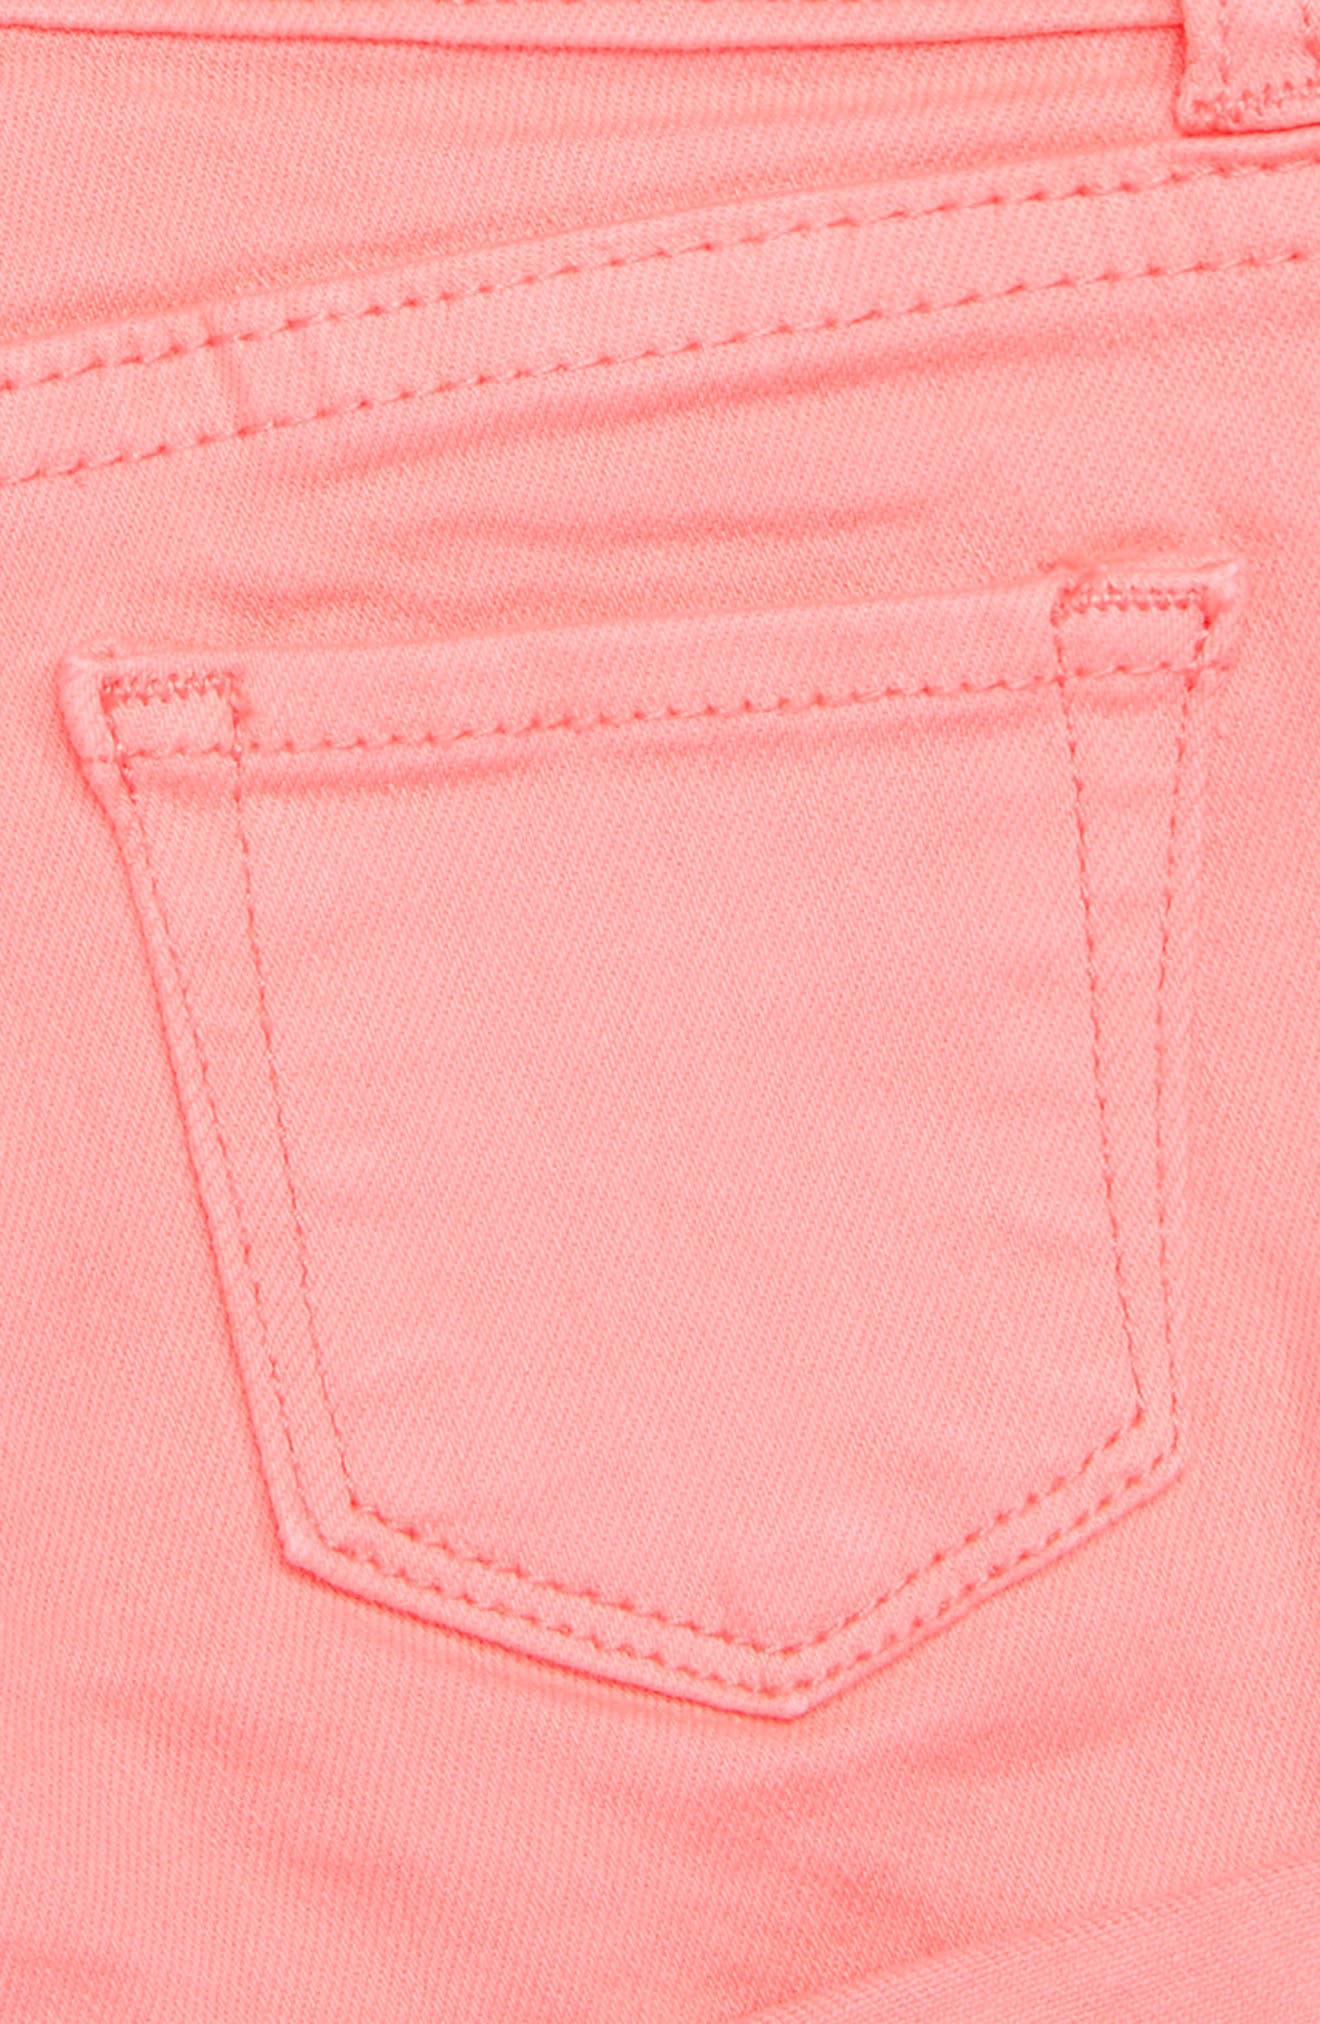 Griffin Stretch Cotton Shorts,                             Alternate thumbnail 3, color,                             Neon Coral